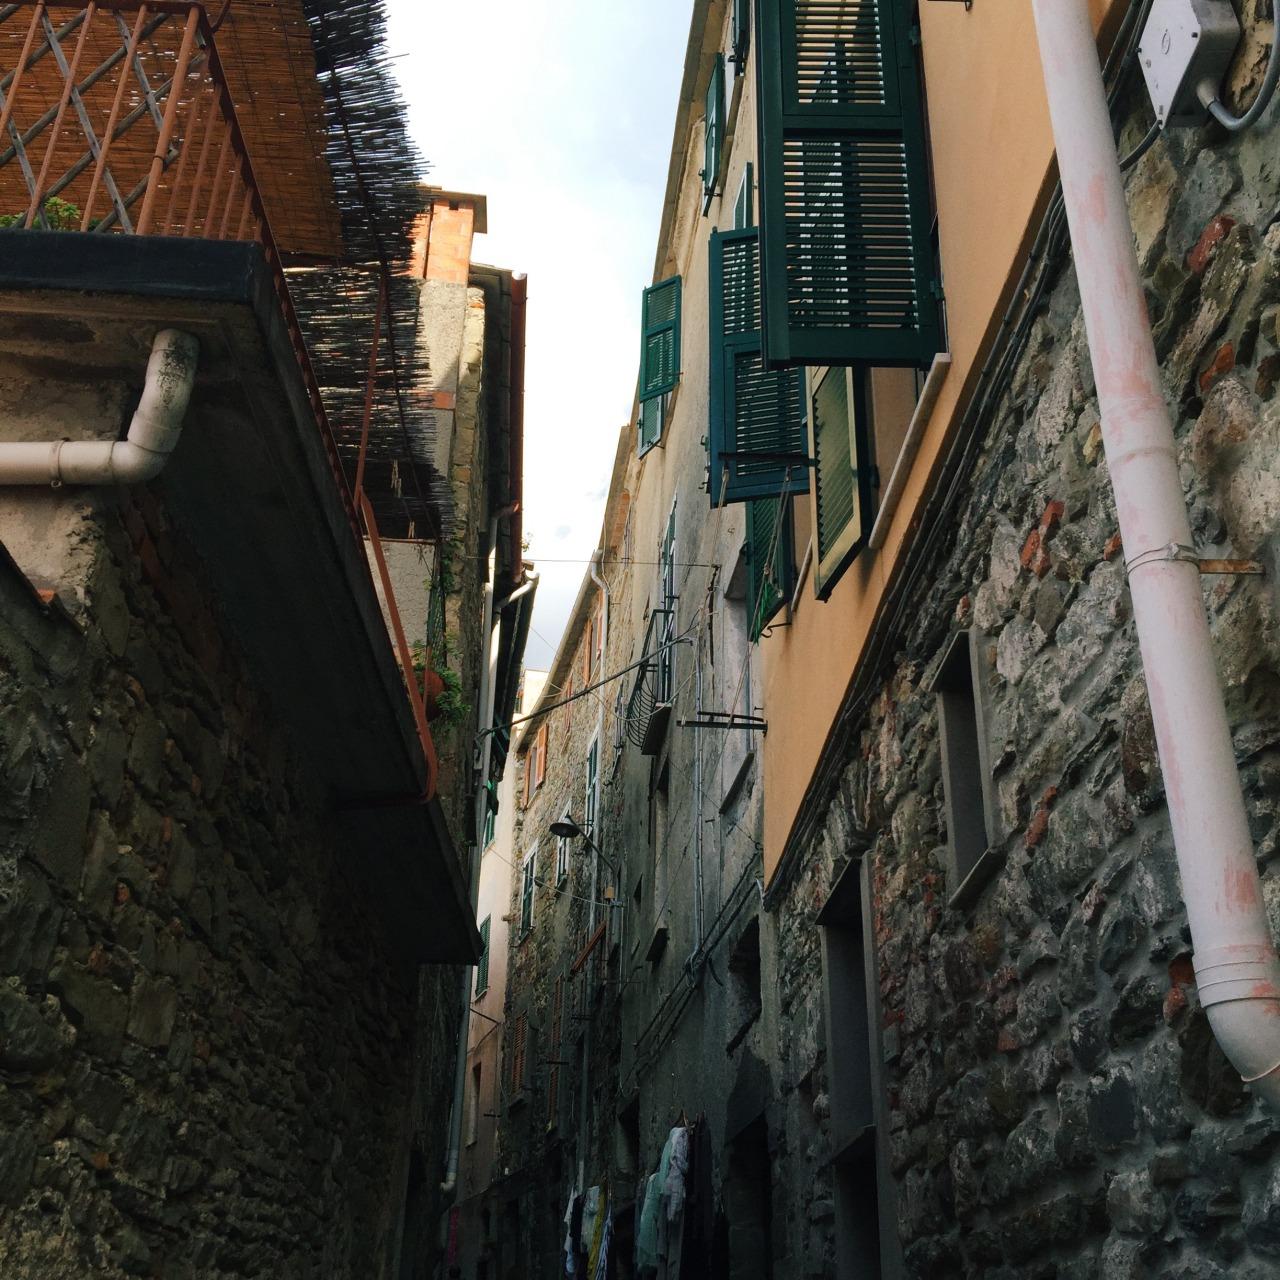 Day 18:Piza - Cinque terre - Florence